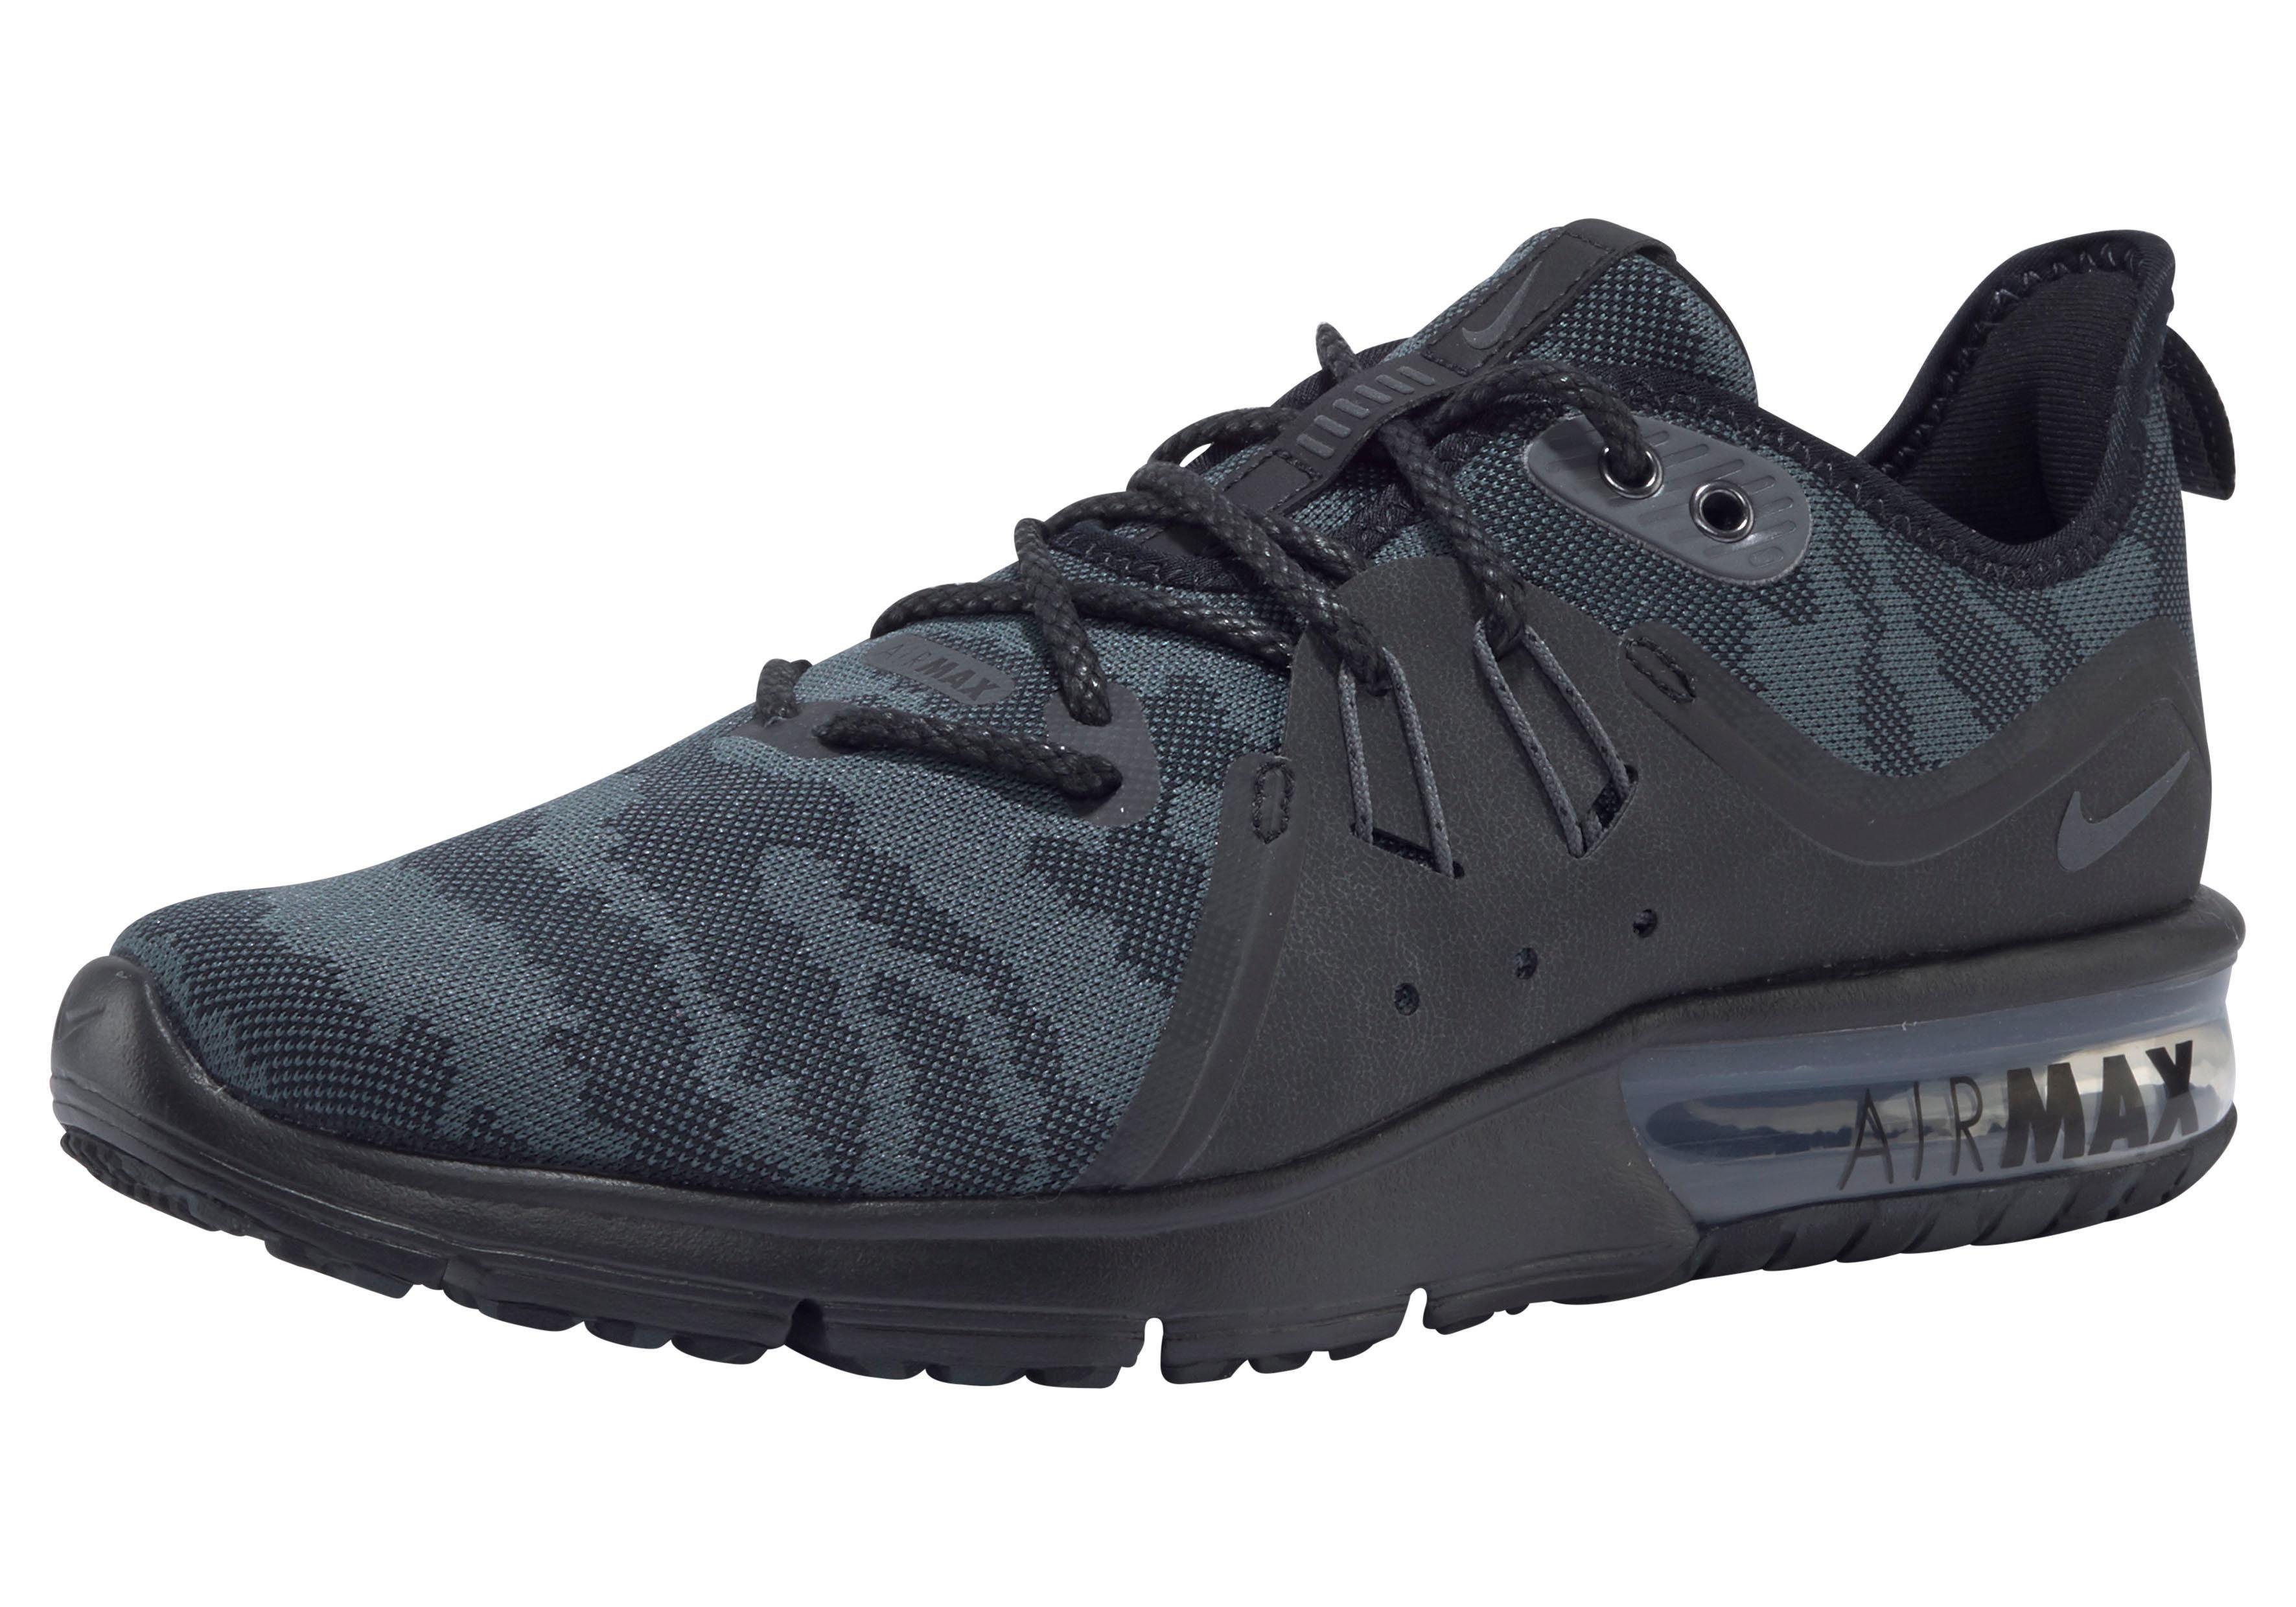 Nike Sportswear »Air Max Sequent 3 Knit PRM Camo« Sneaker online kaufen | OTTO